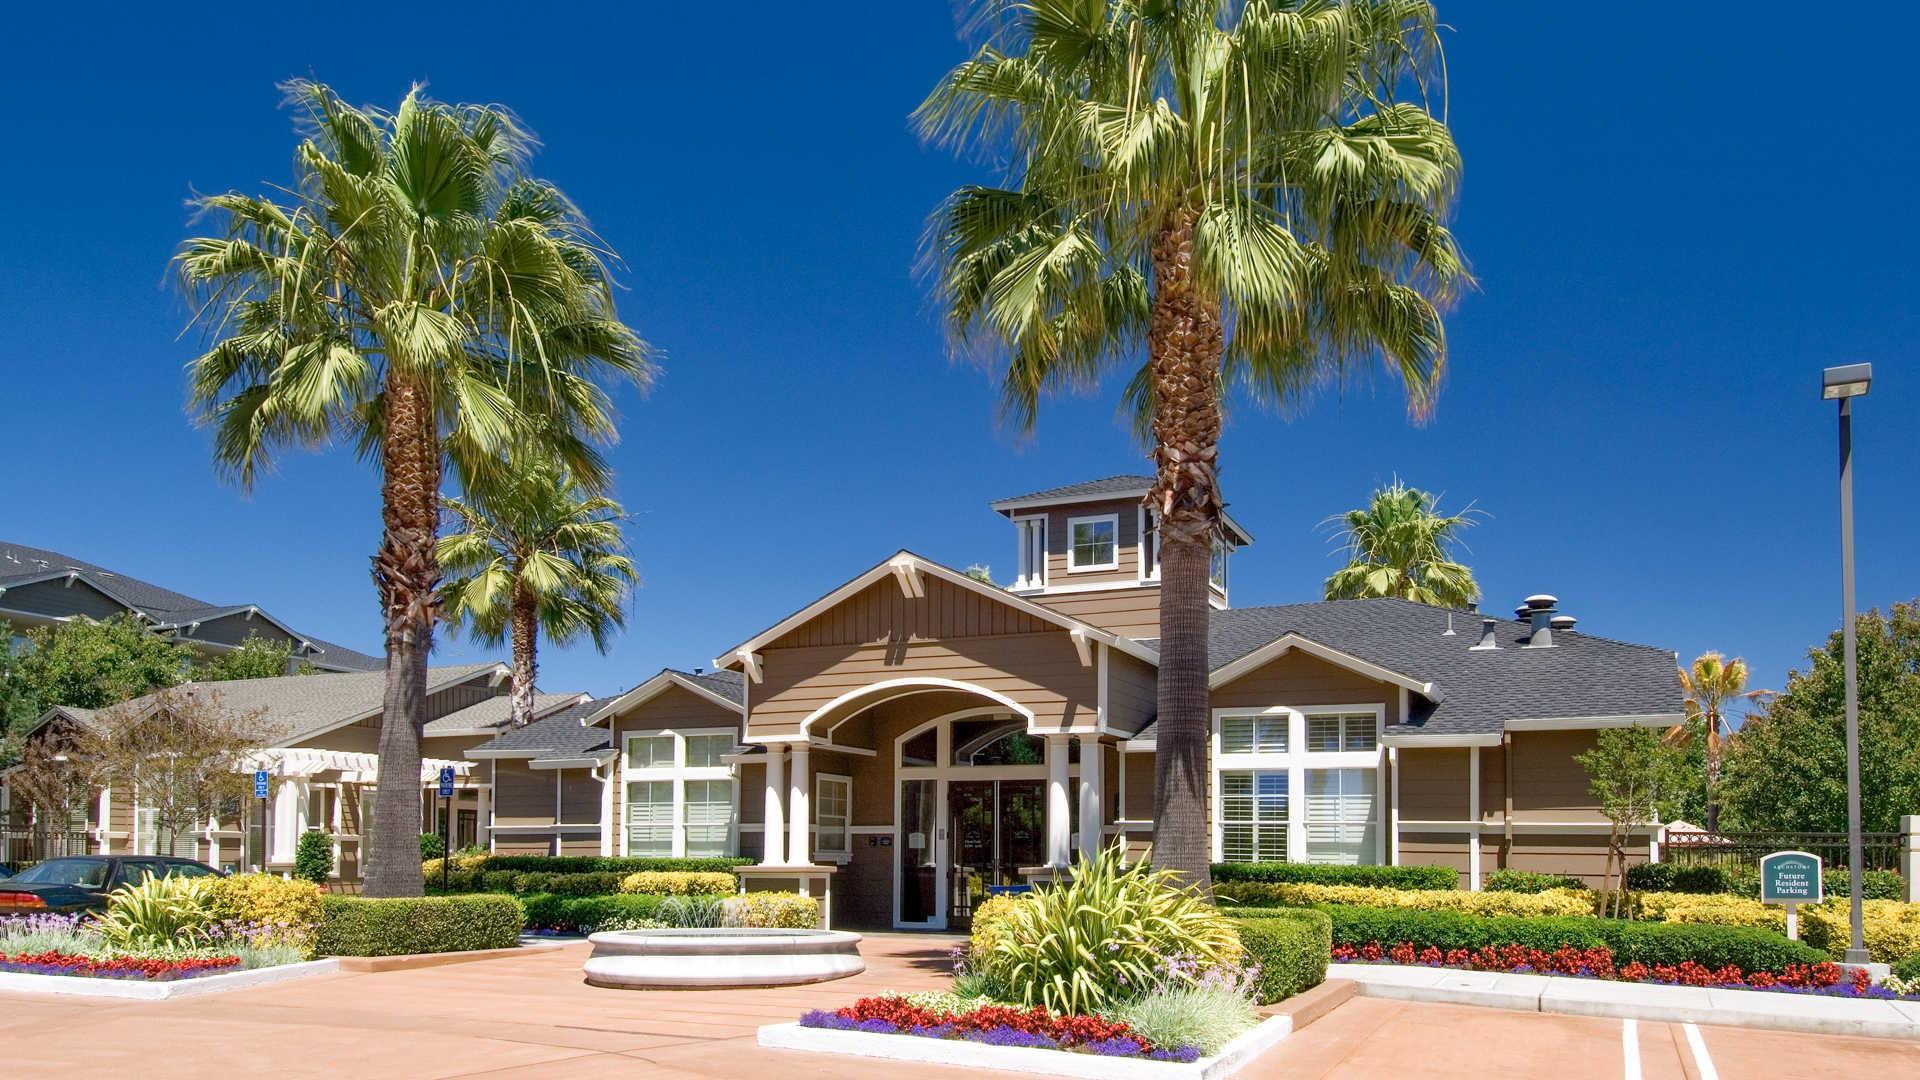 Apartments Near Las Positas Fountains at Emerald Park for Las Positas College Students in Livermore, CA